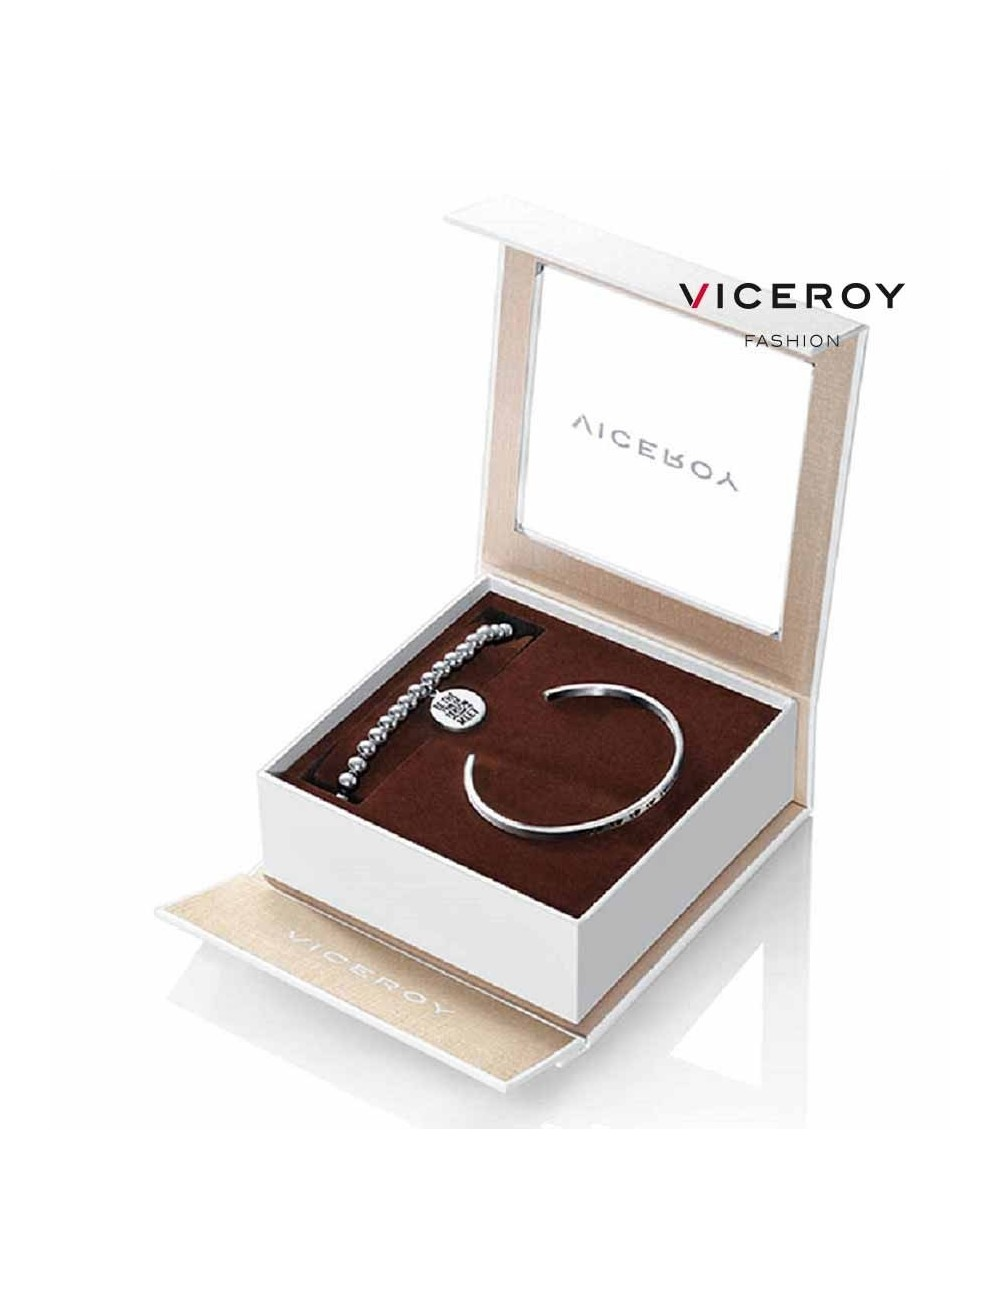 pack-dos-pulseras-viceroy-fashion-acero-90053k00000